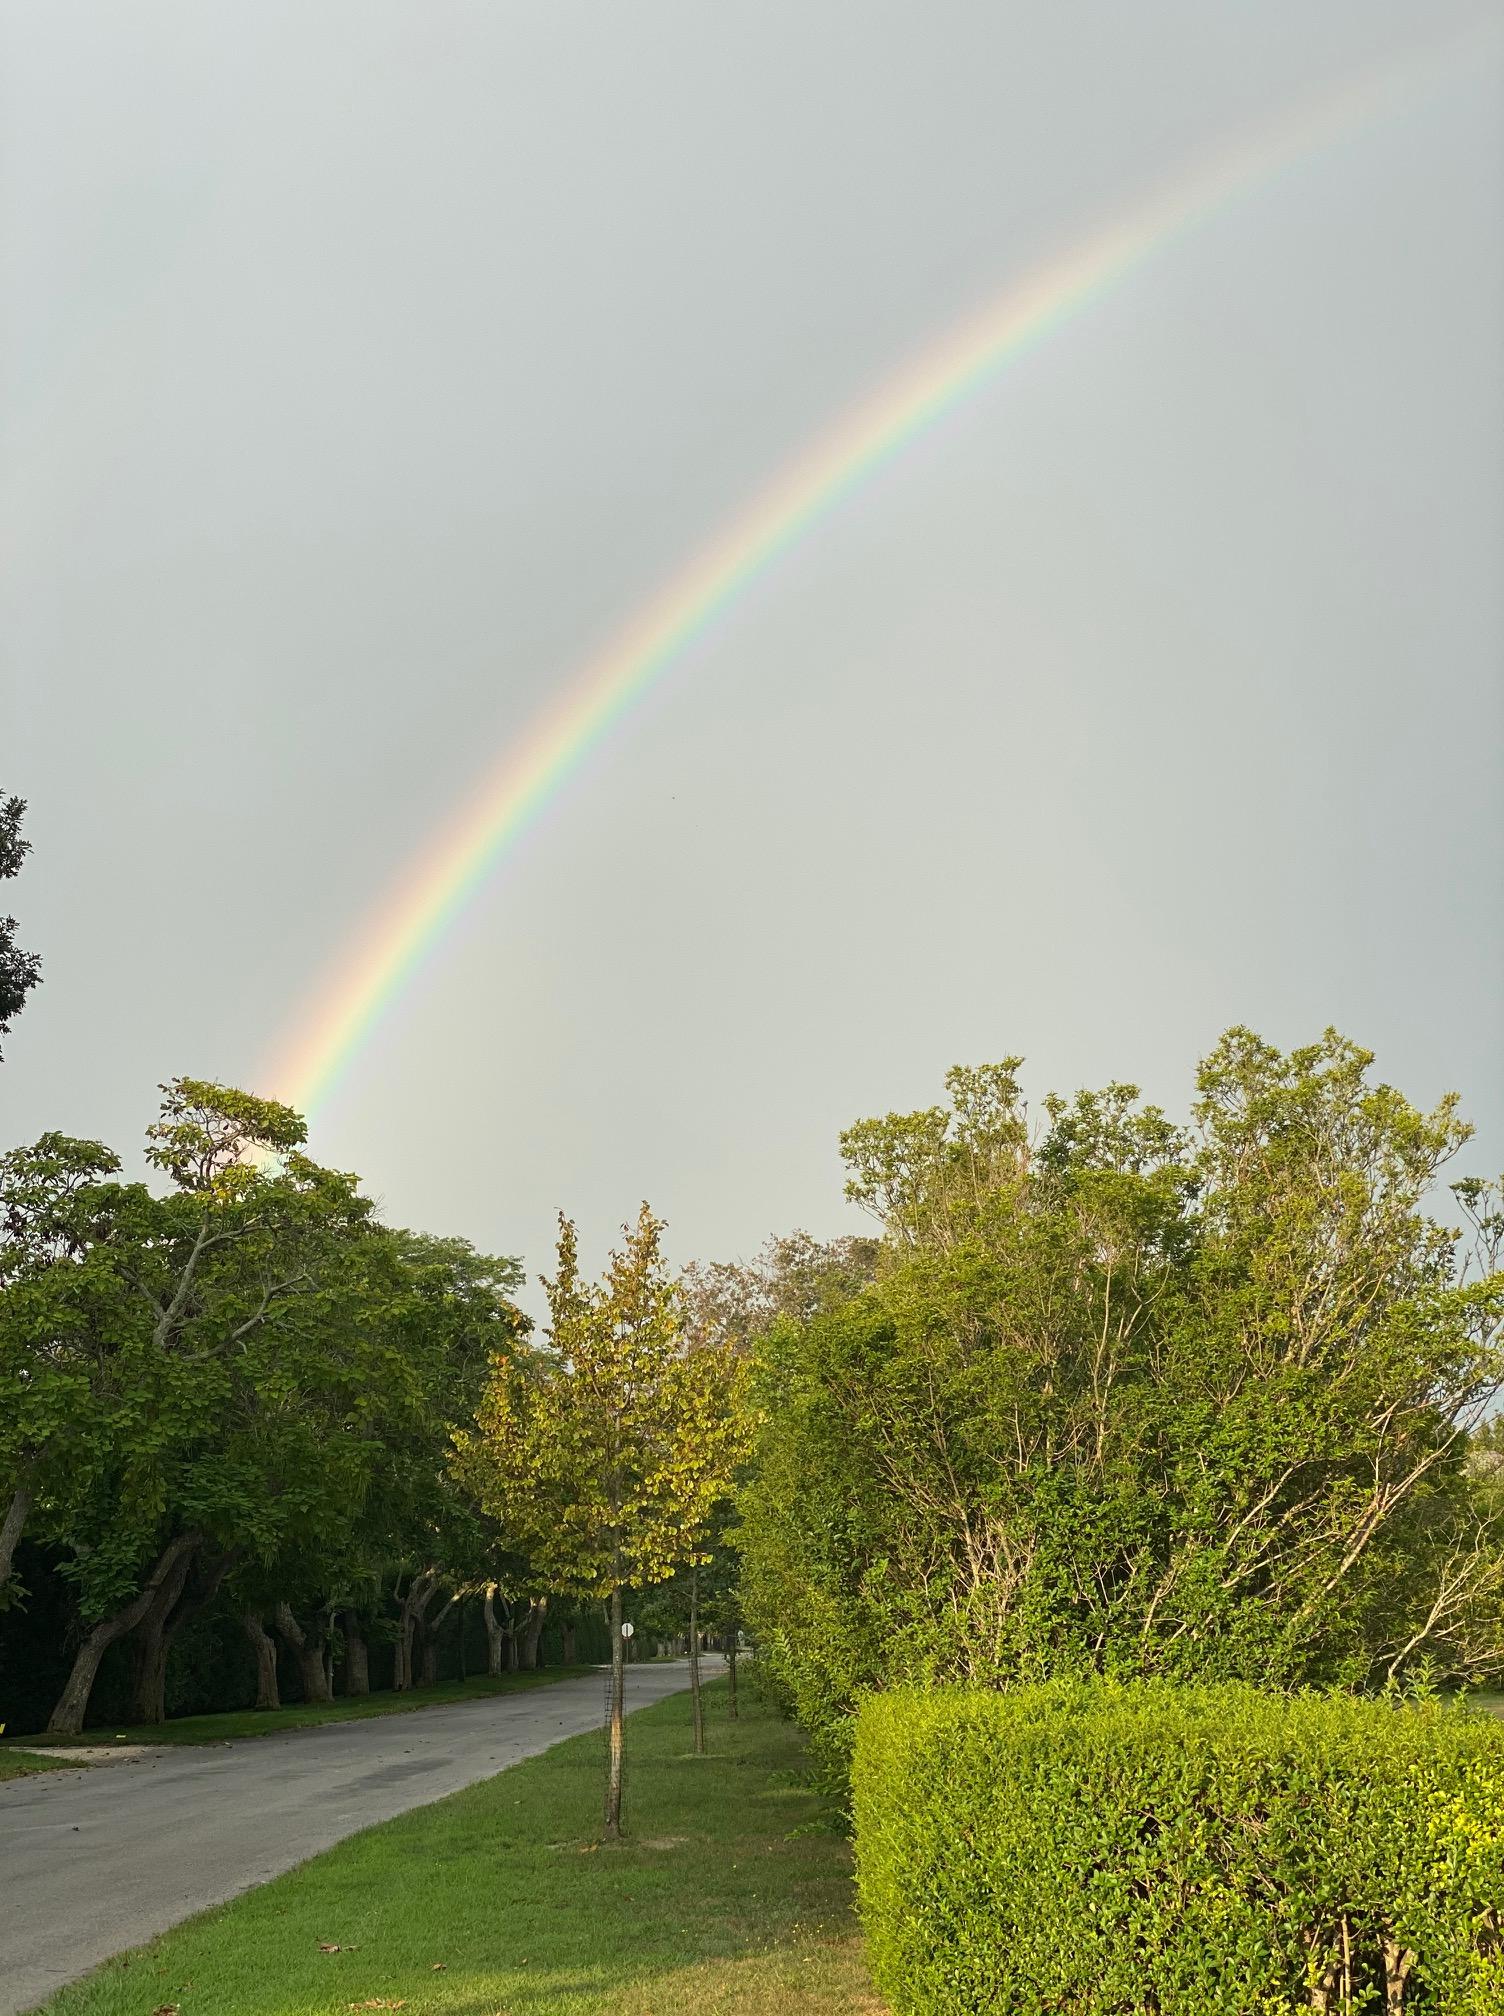 Qua Rainbow LM